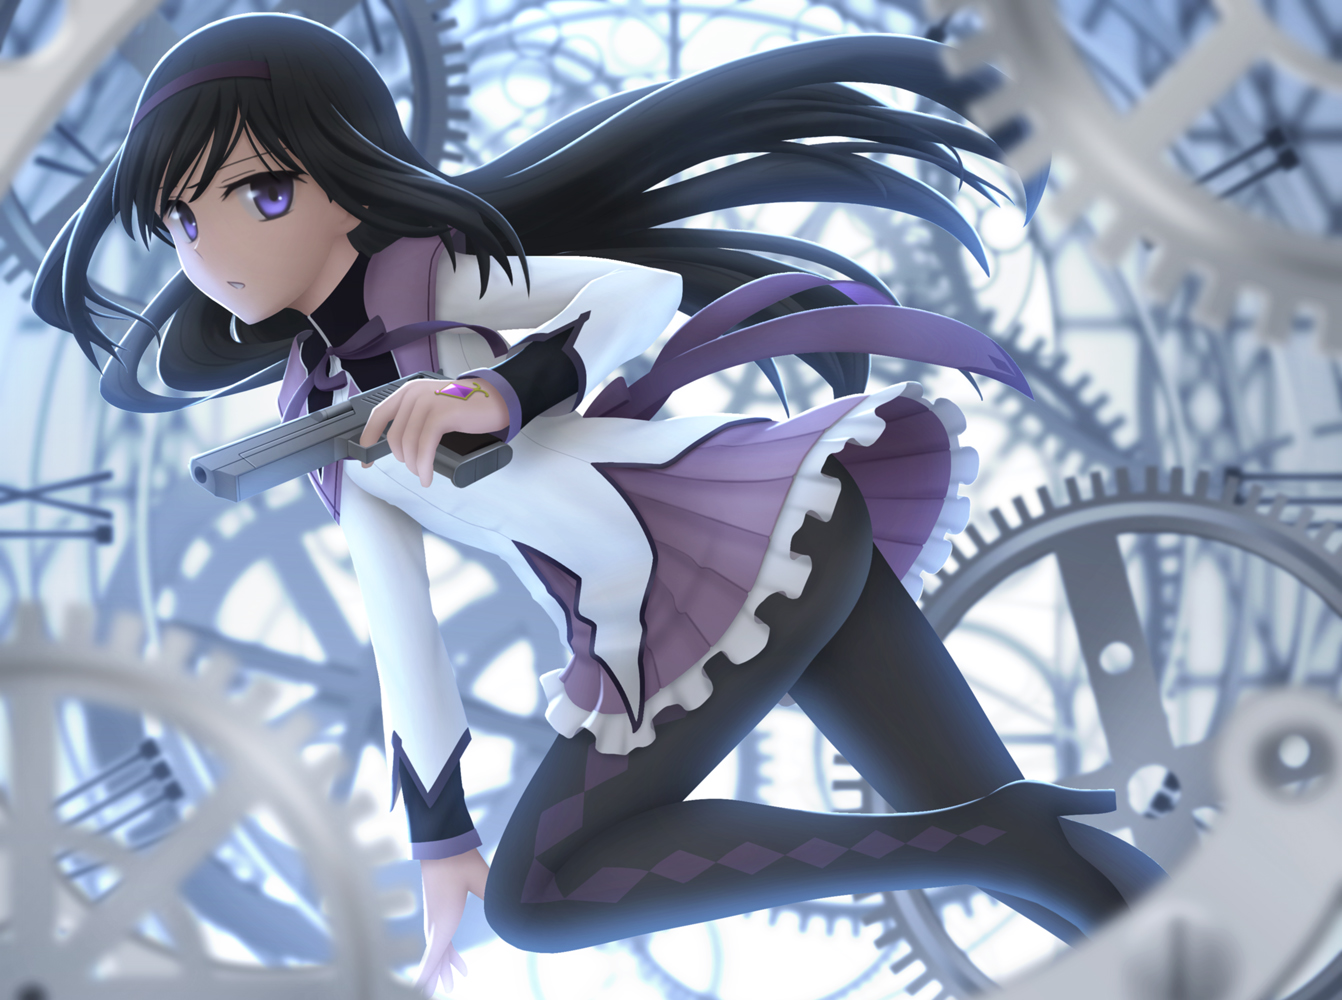 akemi_homura black_hair gun headband long_hair mahou_shoujo_madoka_magica pantyhose purple_eyes school_uniform siraha skirt weapon